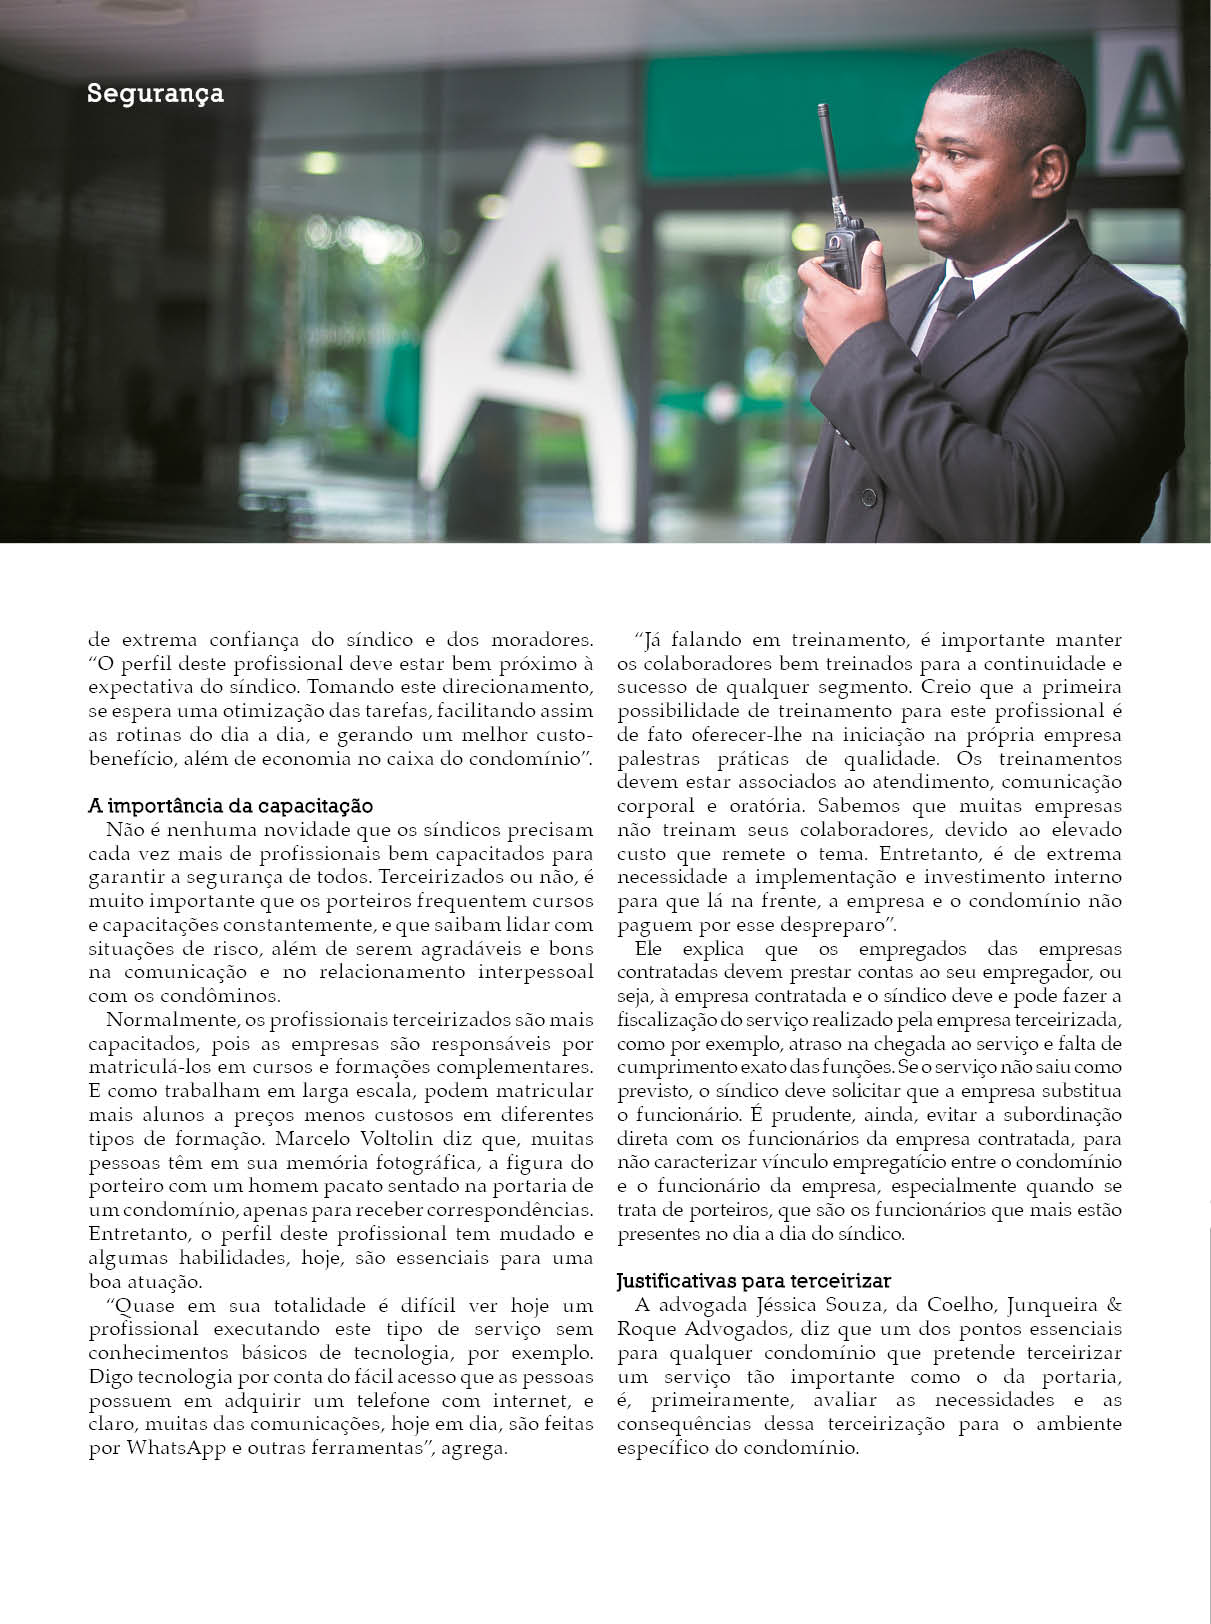 Revista Síndico_ed 23926